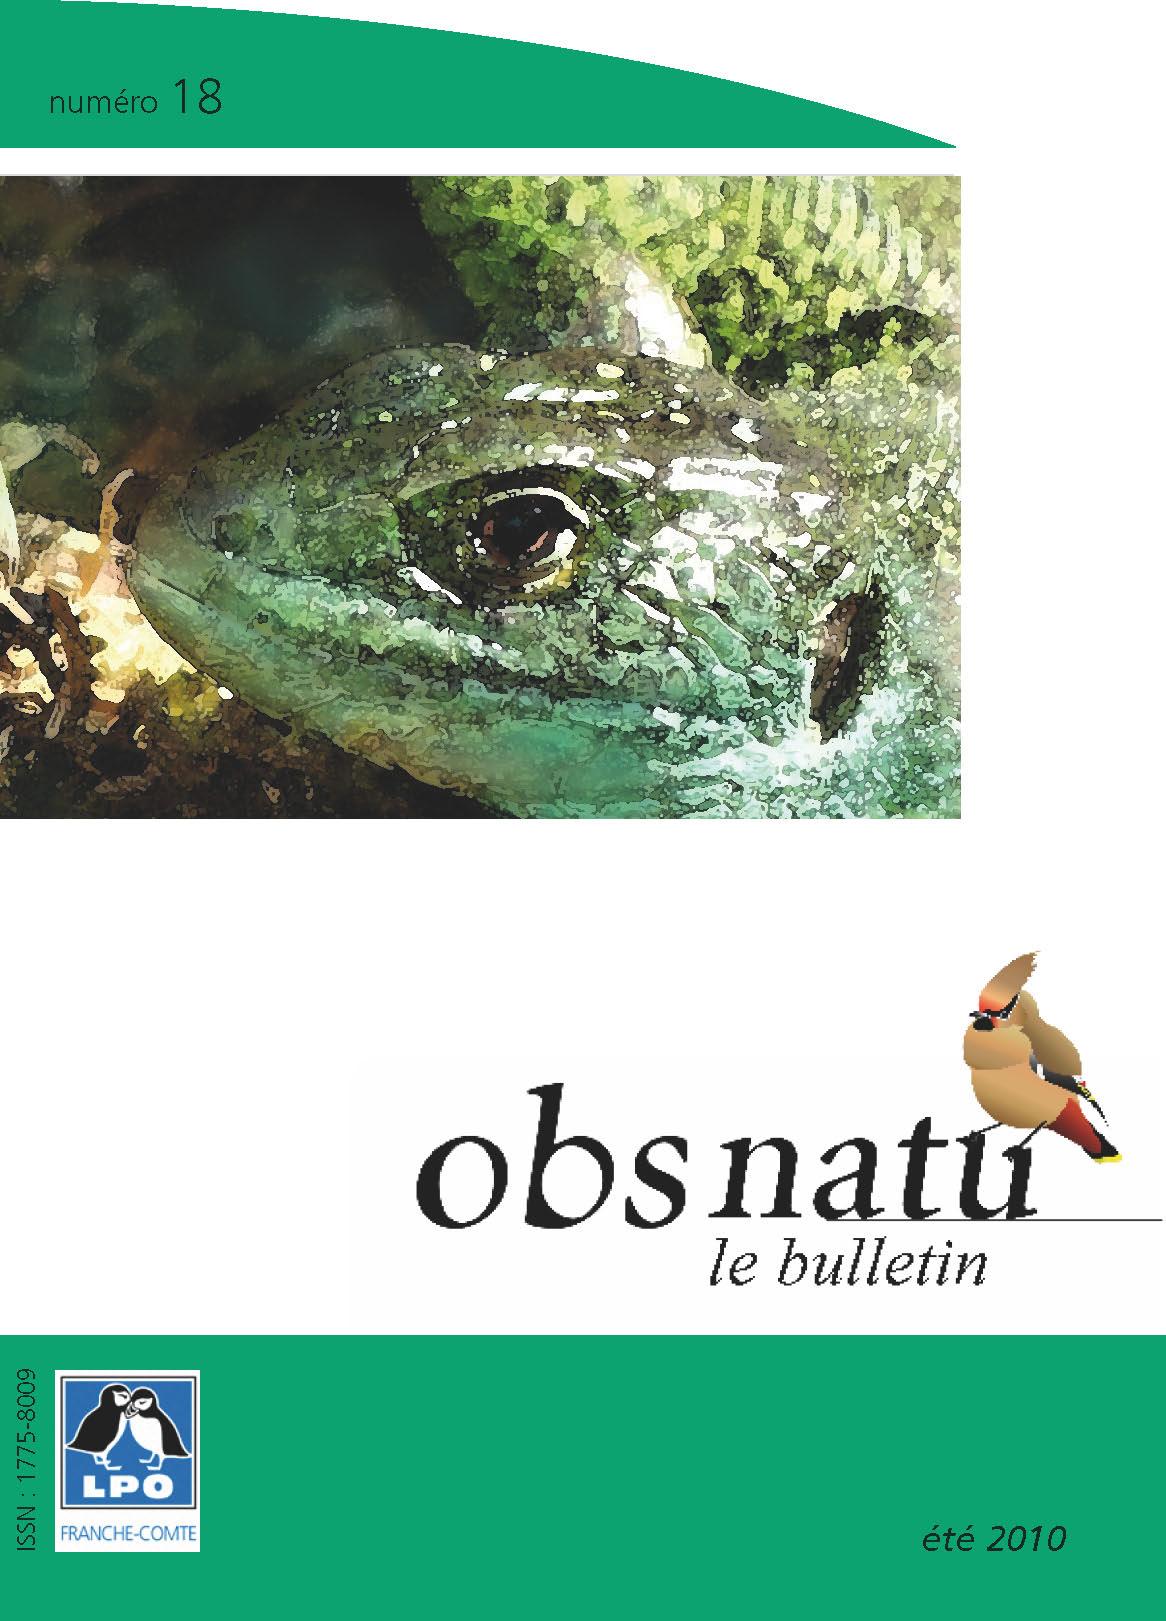 http://files.biolovision.net/franche-comte.lpo.fr/userfiles/publications/Obsnatubulls/Obsnatu18-Ete2010bdPage01.jpg